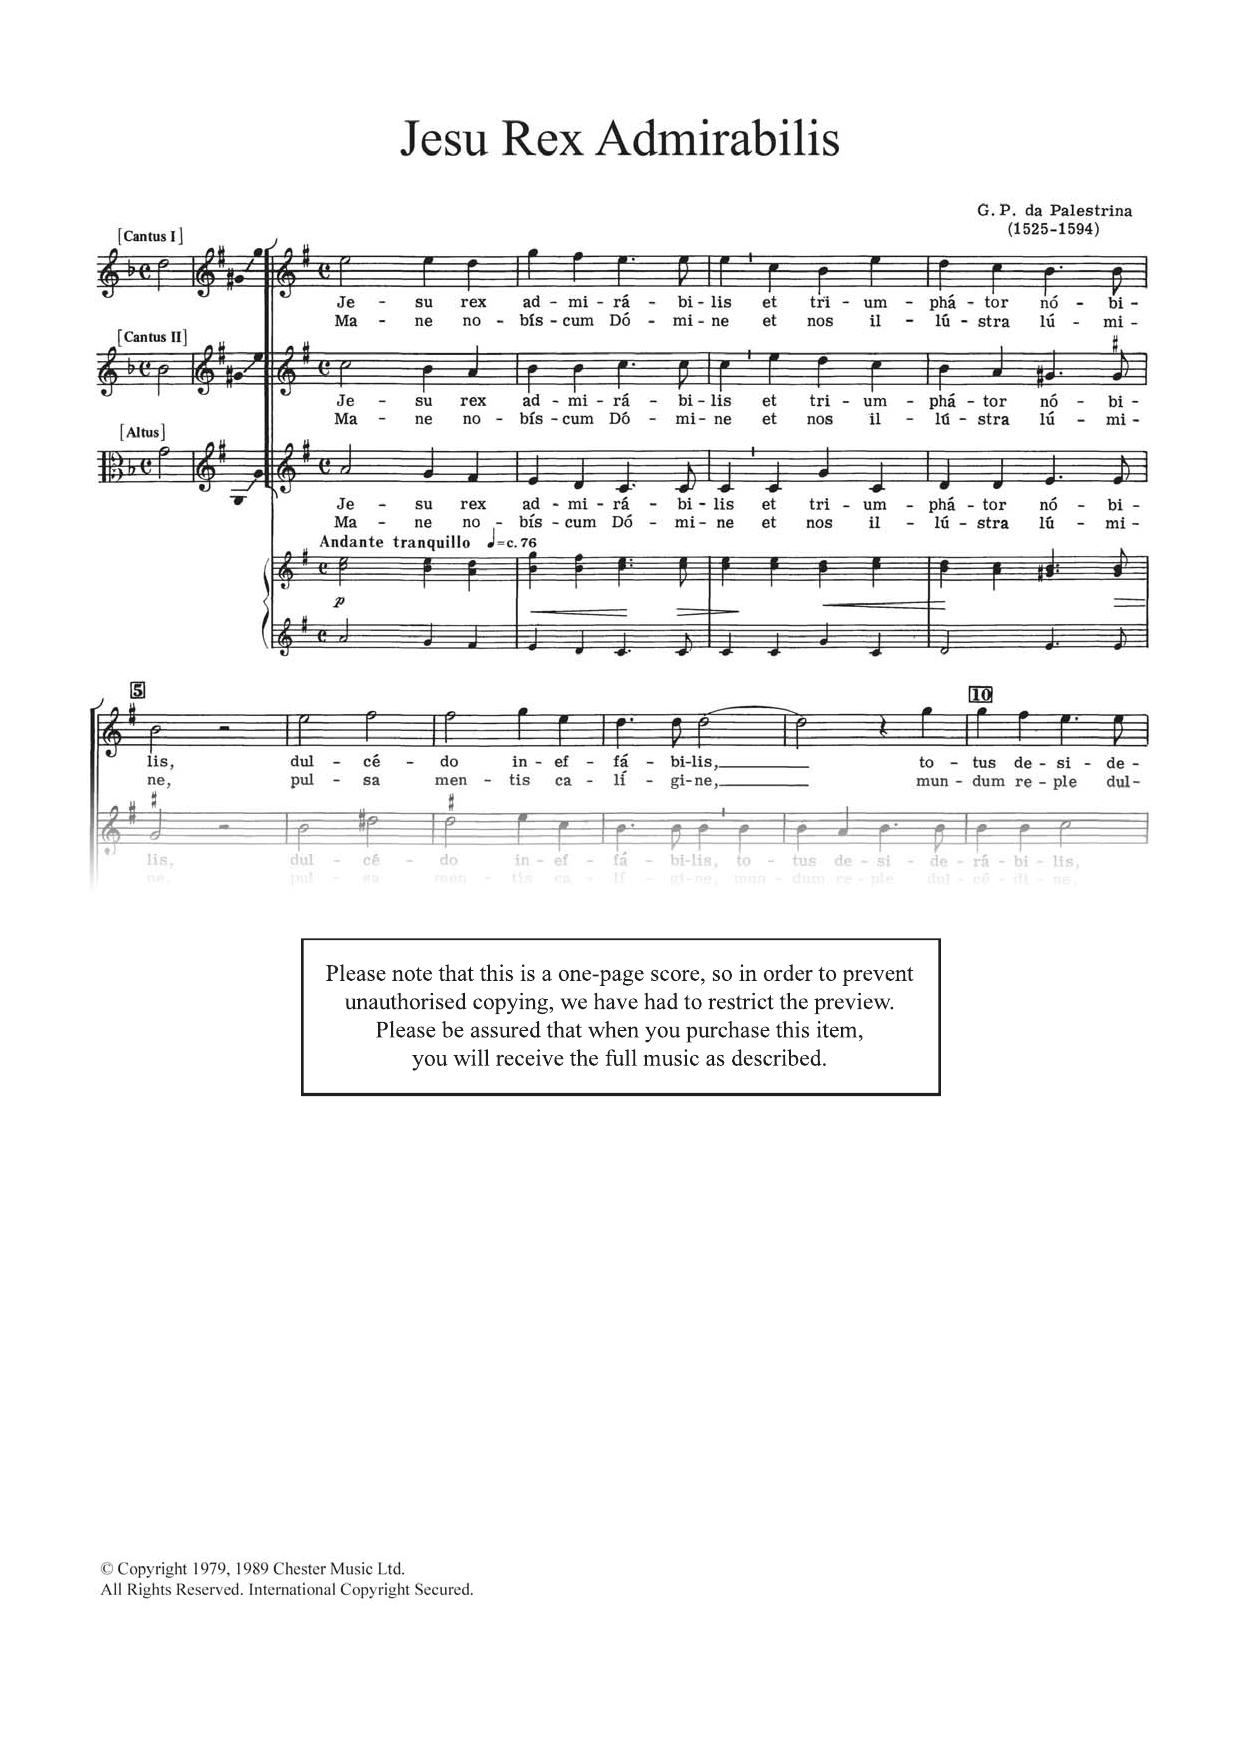 Jesu Rex Admirabilis Sheet Music